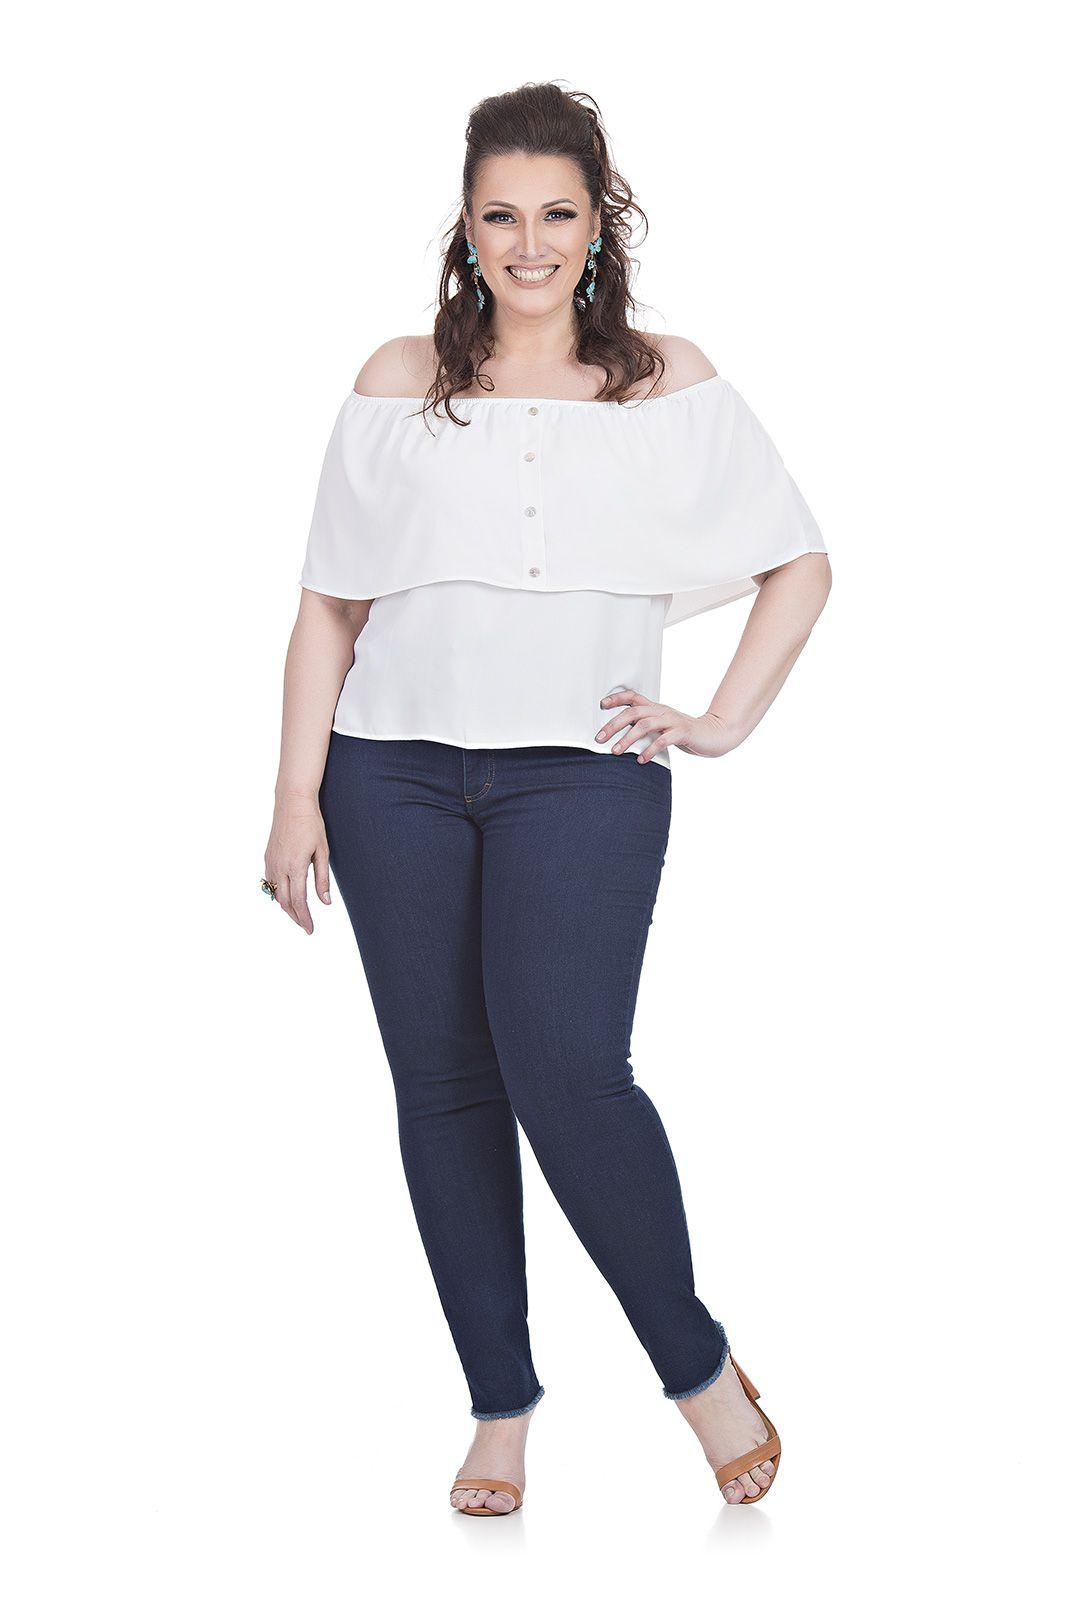 Calça Malha cor Jeans Plus Size